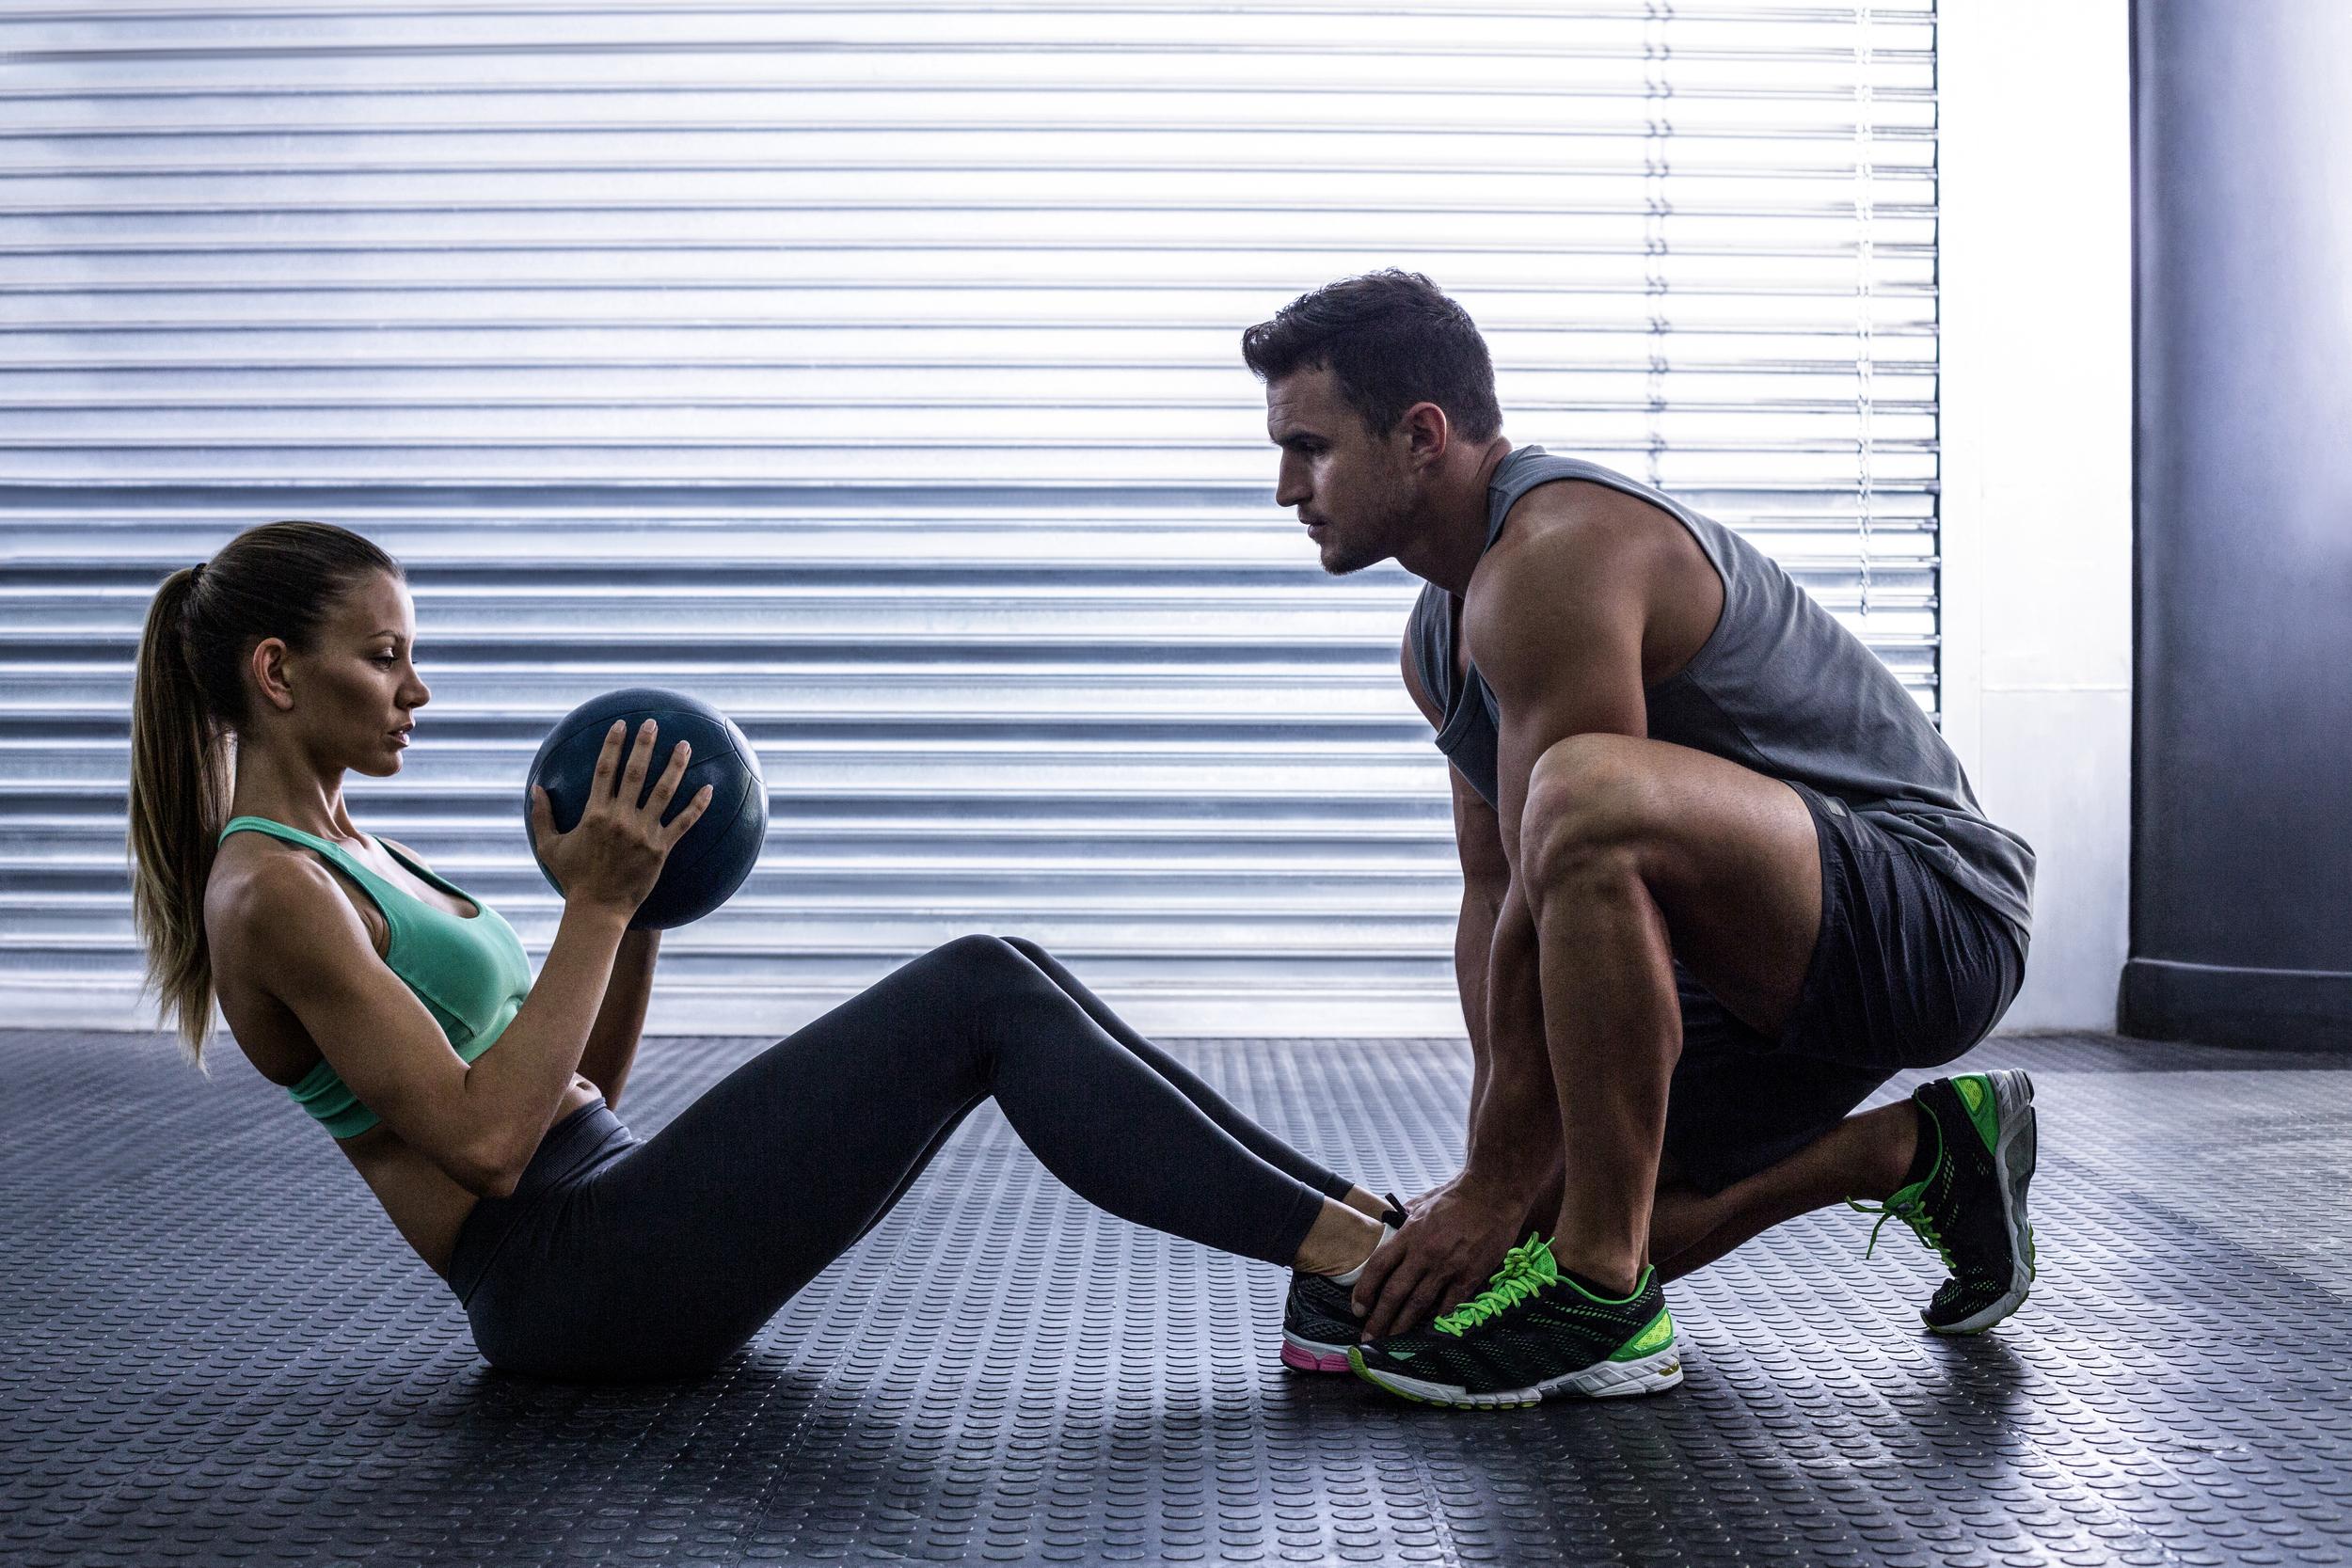 partner-personal-trainer-abs.jpg (2500×1667)